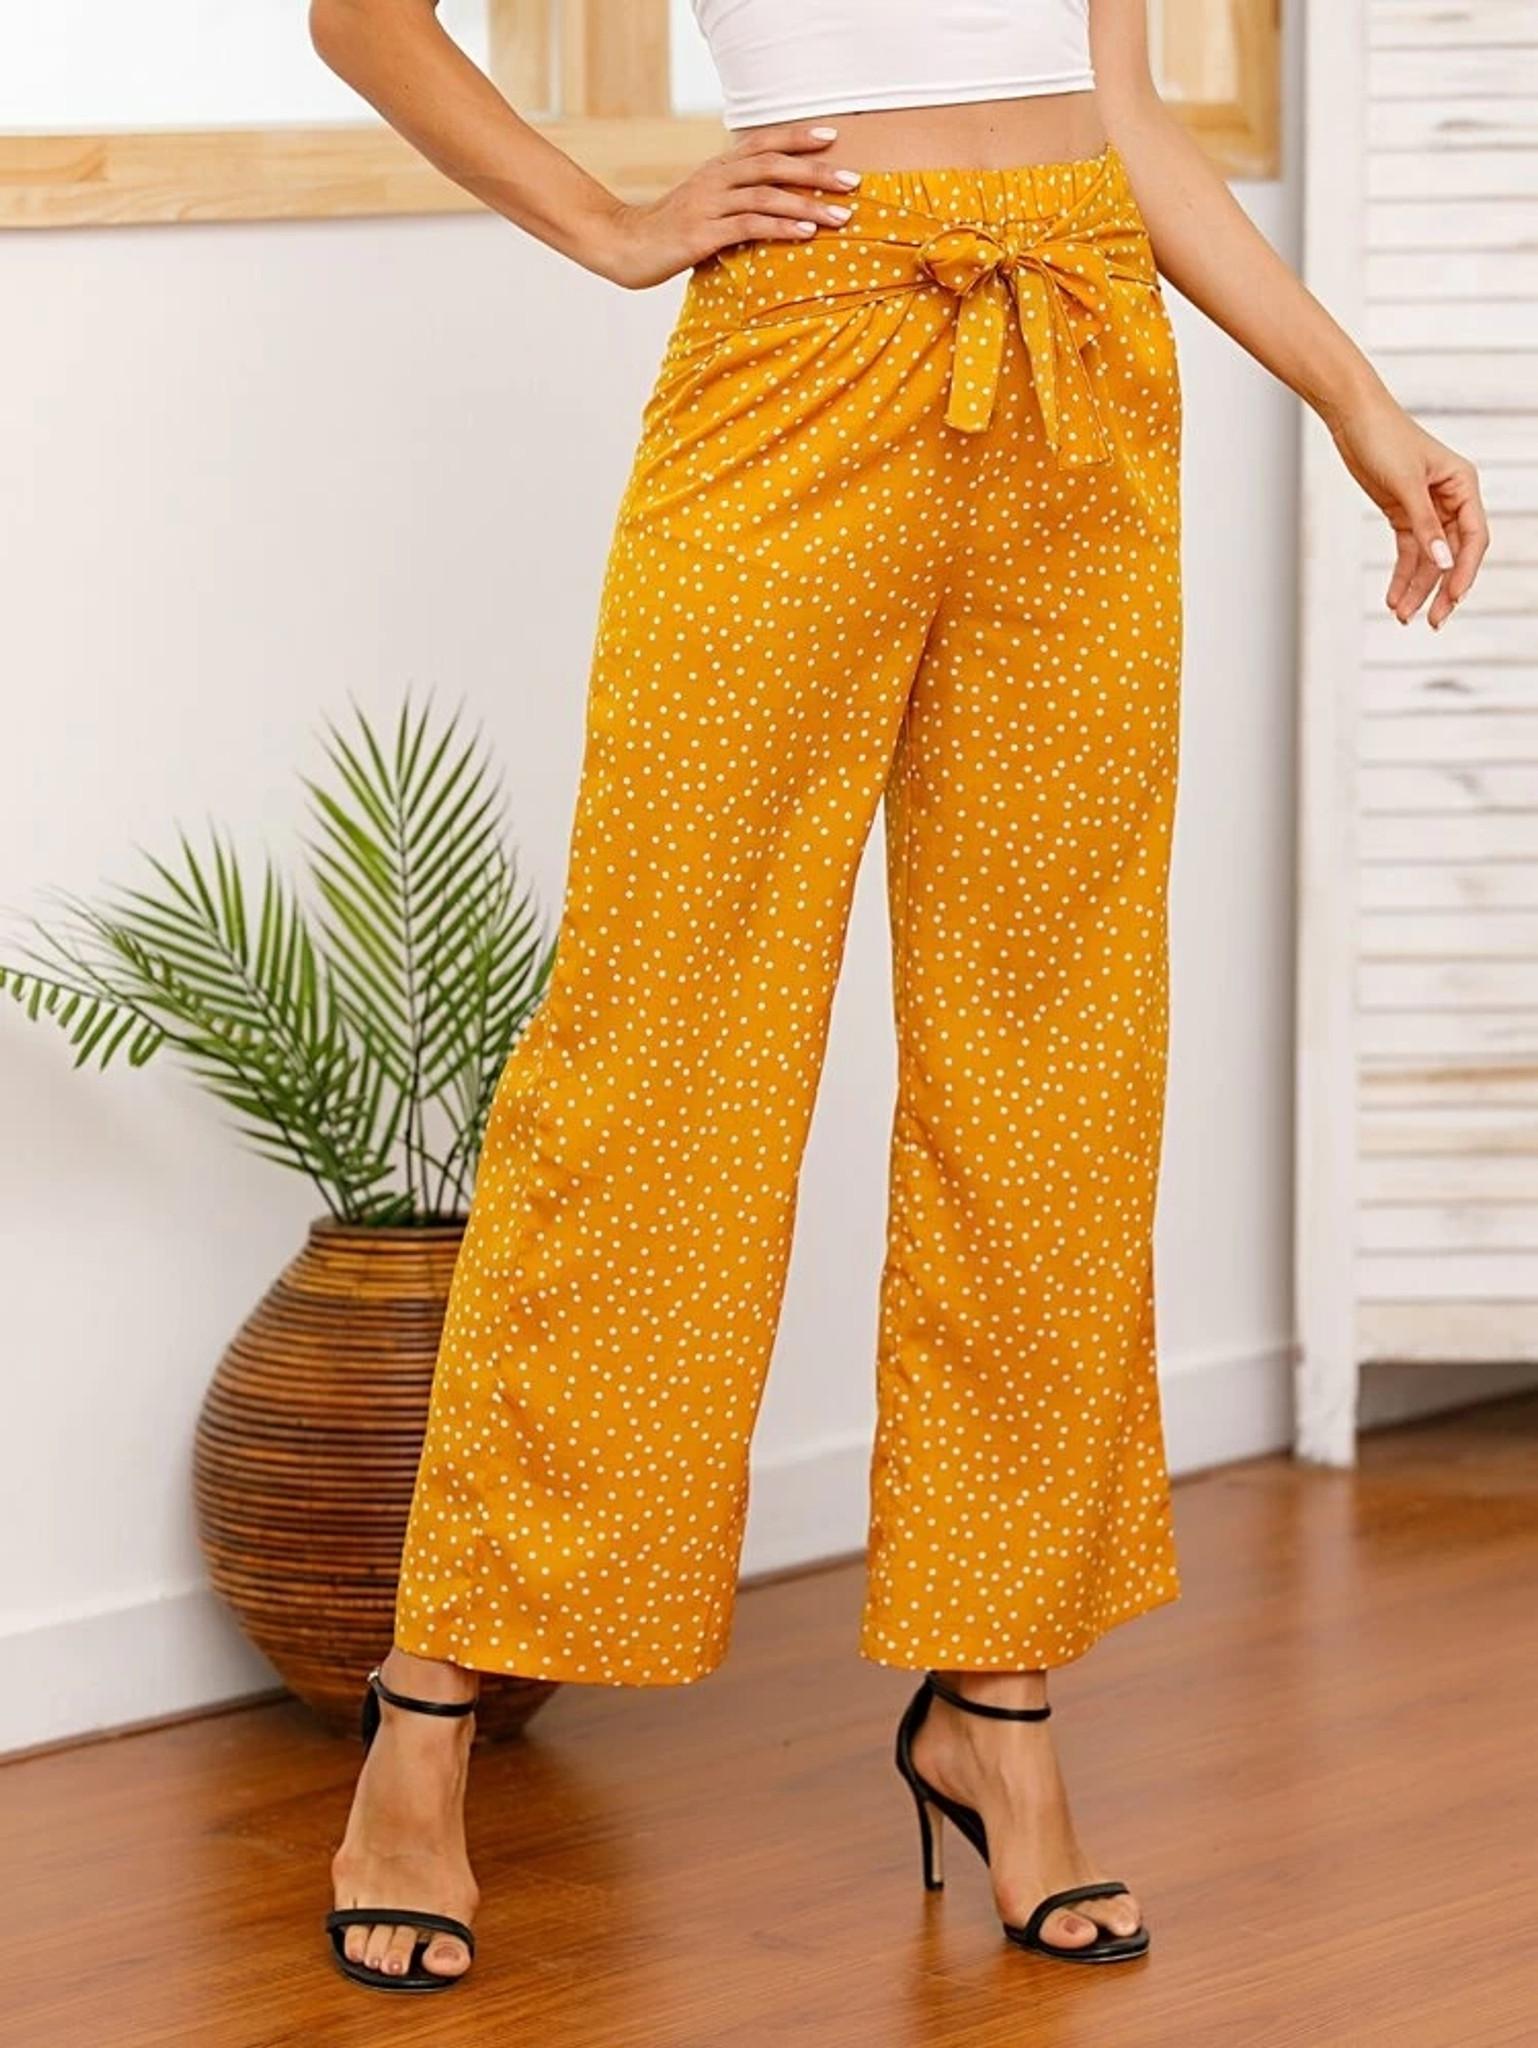 Fifth Avenue Cotton GTTWP32 Polka Dot Print Pants